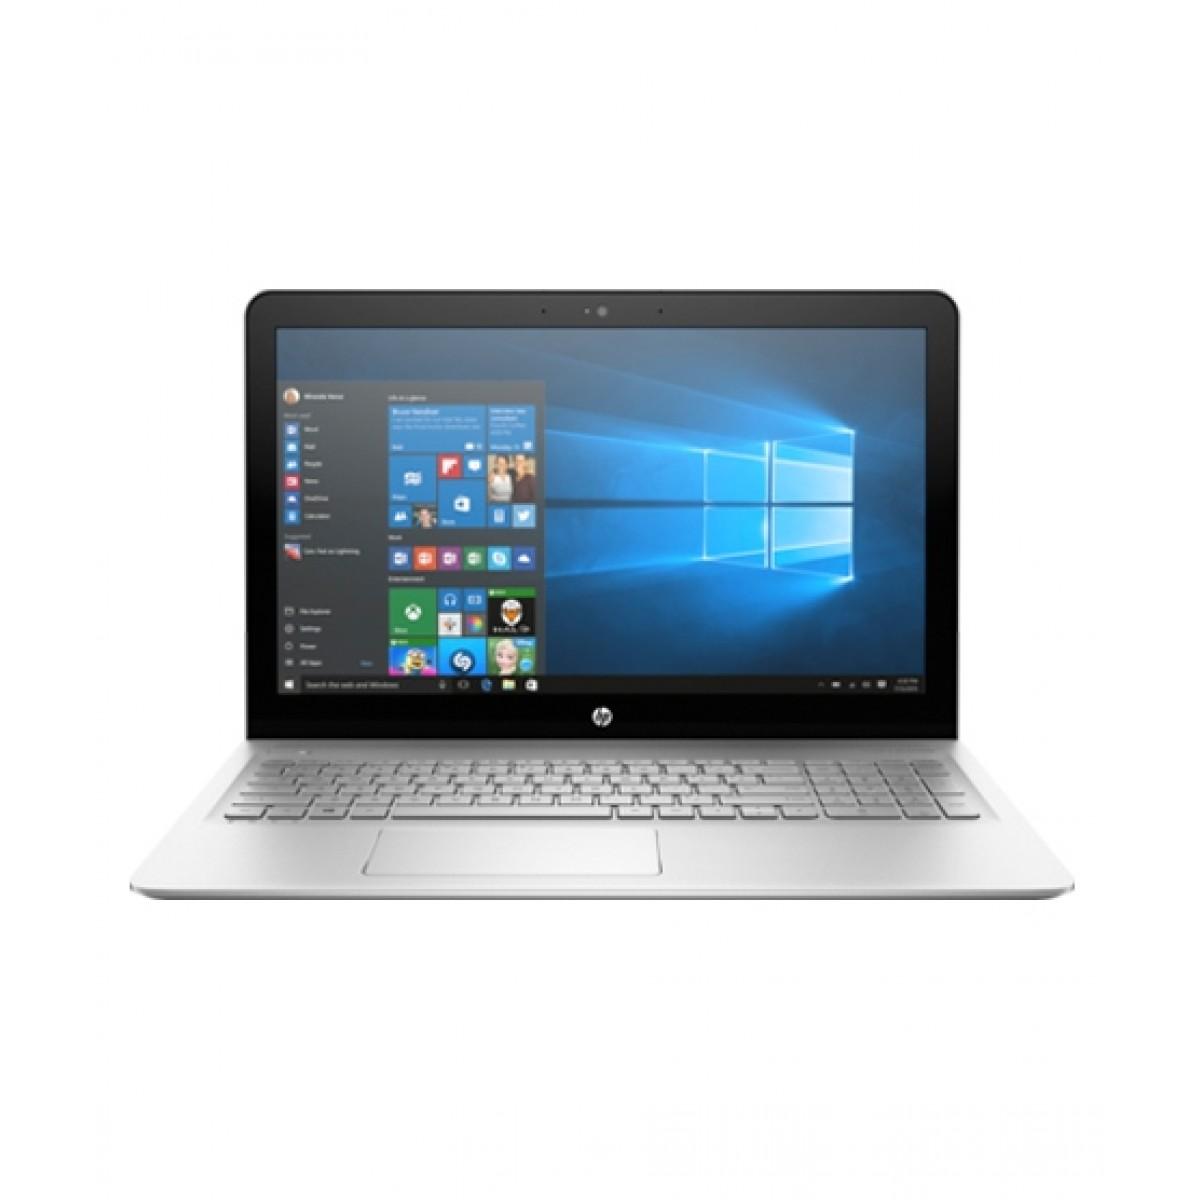 "HP Envy 15.6"" Core i5 7th Gen 1TB Notebook (15-AS104TU)"